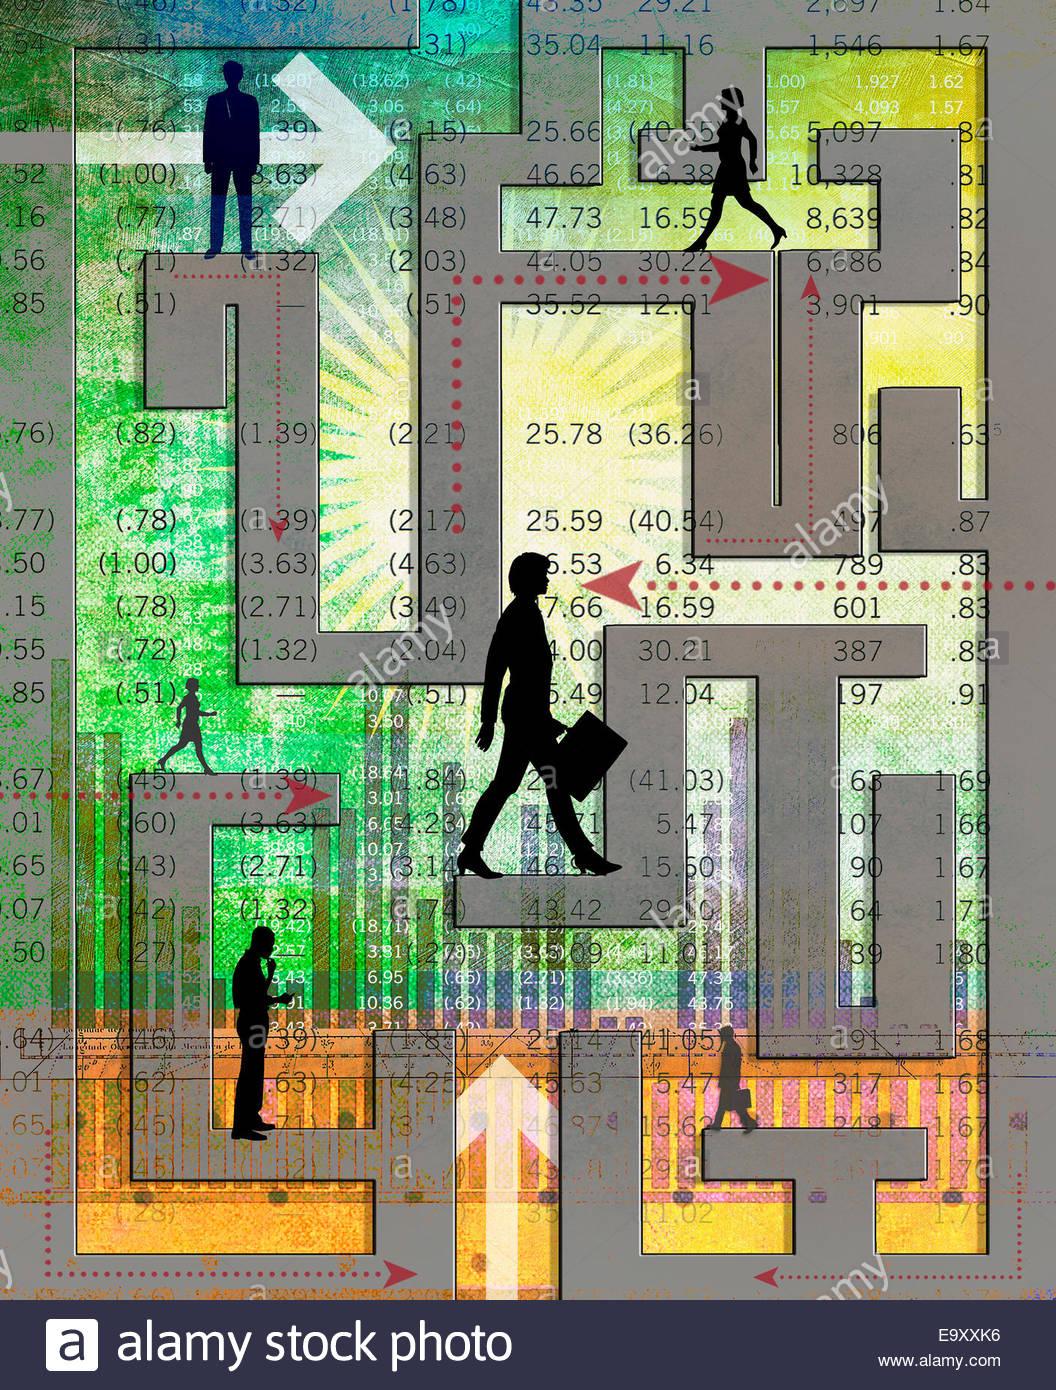 Geschäftsleute, die Navigation durch komplexe finanzielle Labyrinth Stockbild